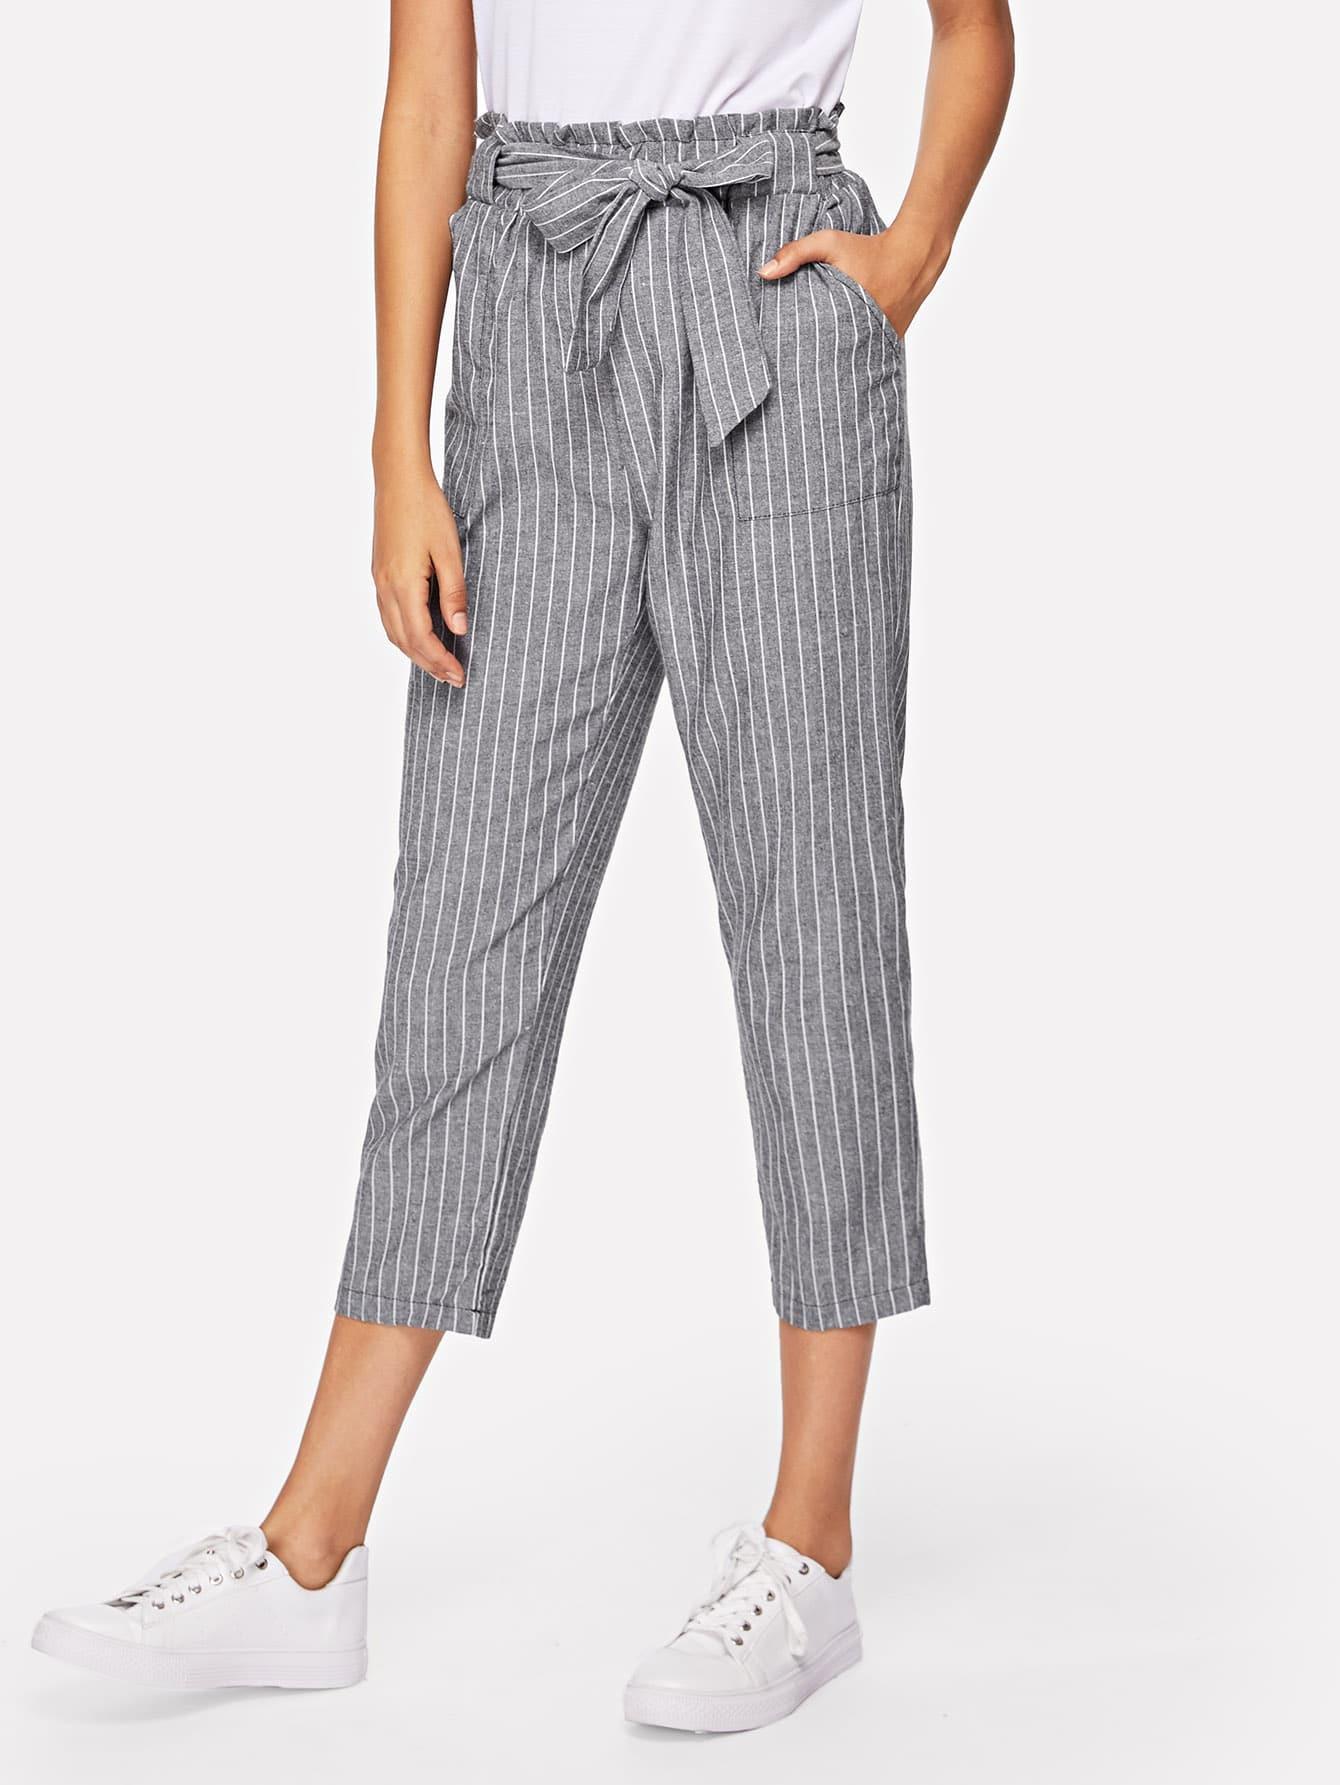 Frill Trim Striped Self Tie Waist Pants frill trim bow tie front pants